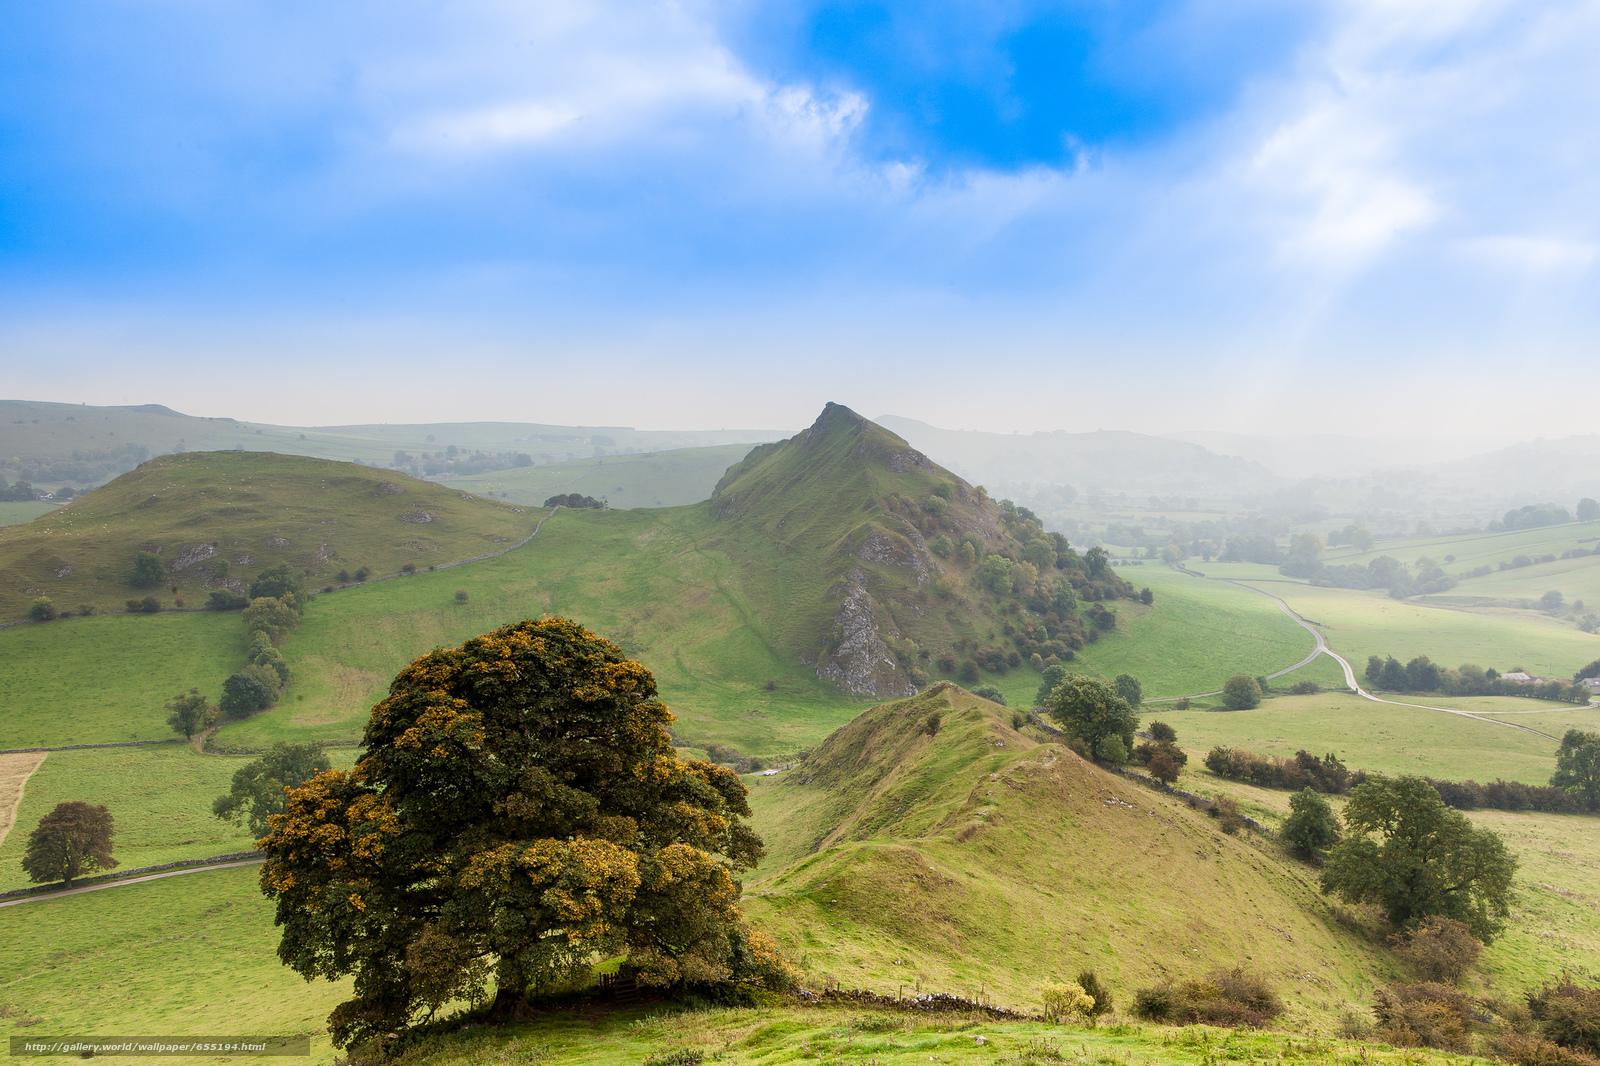 Descargar gratis Montañas,  Hills,  árbol,  naturaleza Fondos de escritorio en la resolucin 2048x1365 — imagen №655194